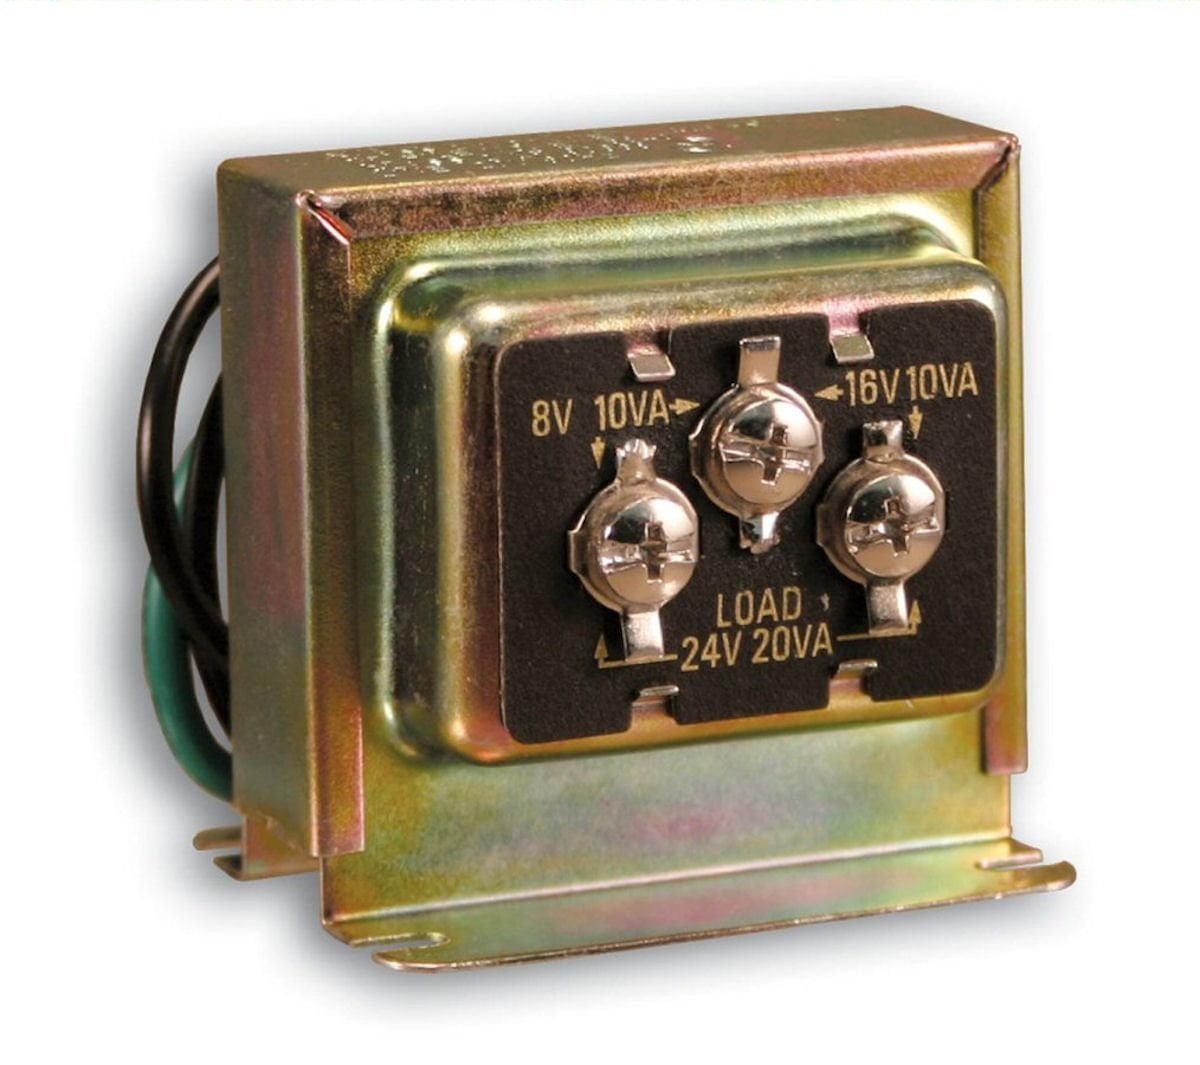 Sl 125 02 Wired Door Chime Transformer Low Voltage Hardwired Edwards Transformers Wiring Diagram By Heath Zenith